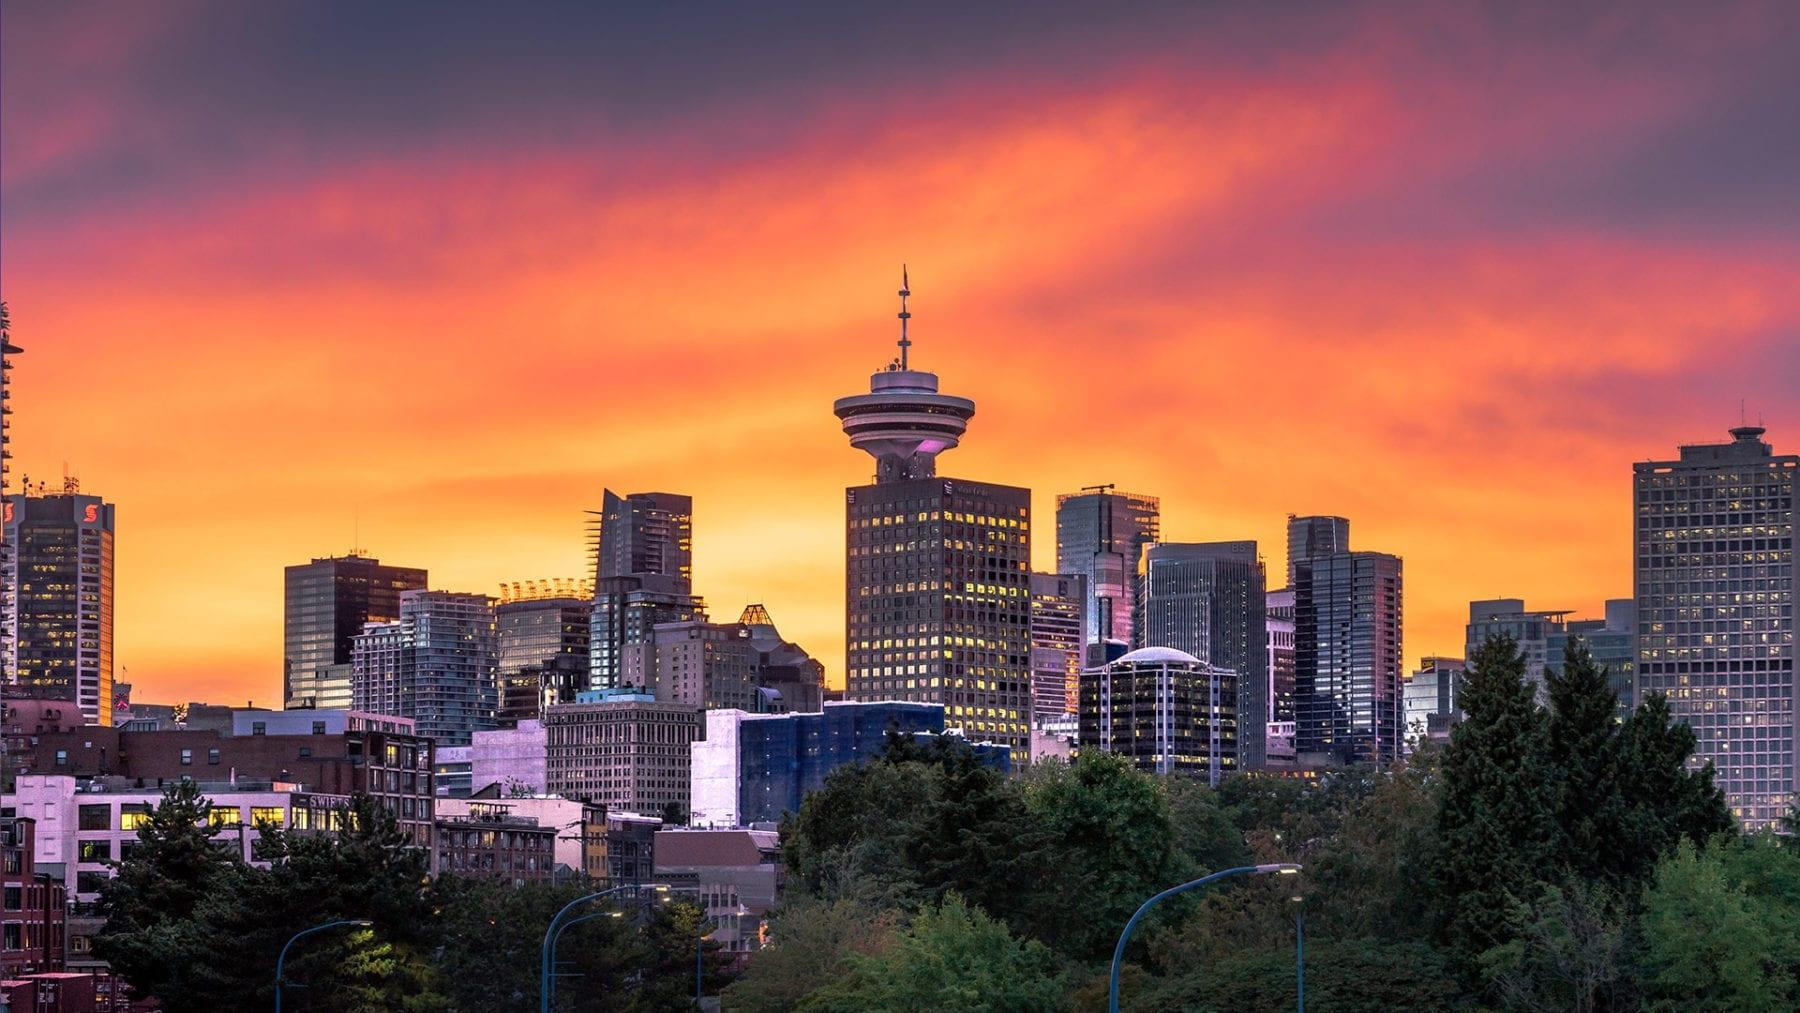 linuxfoundation.org - Register - Open Source Summit North America 2018